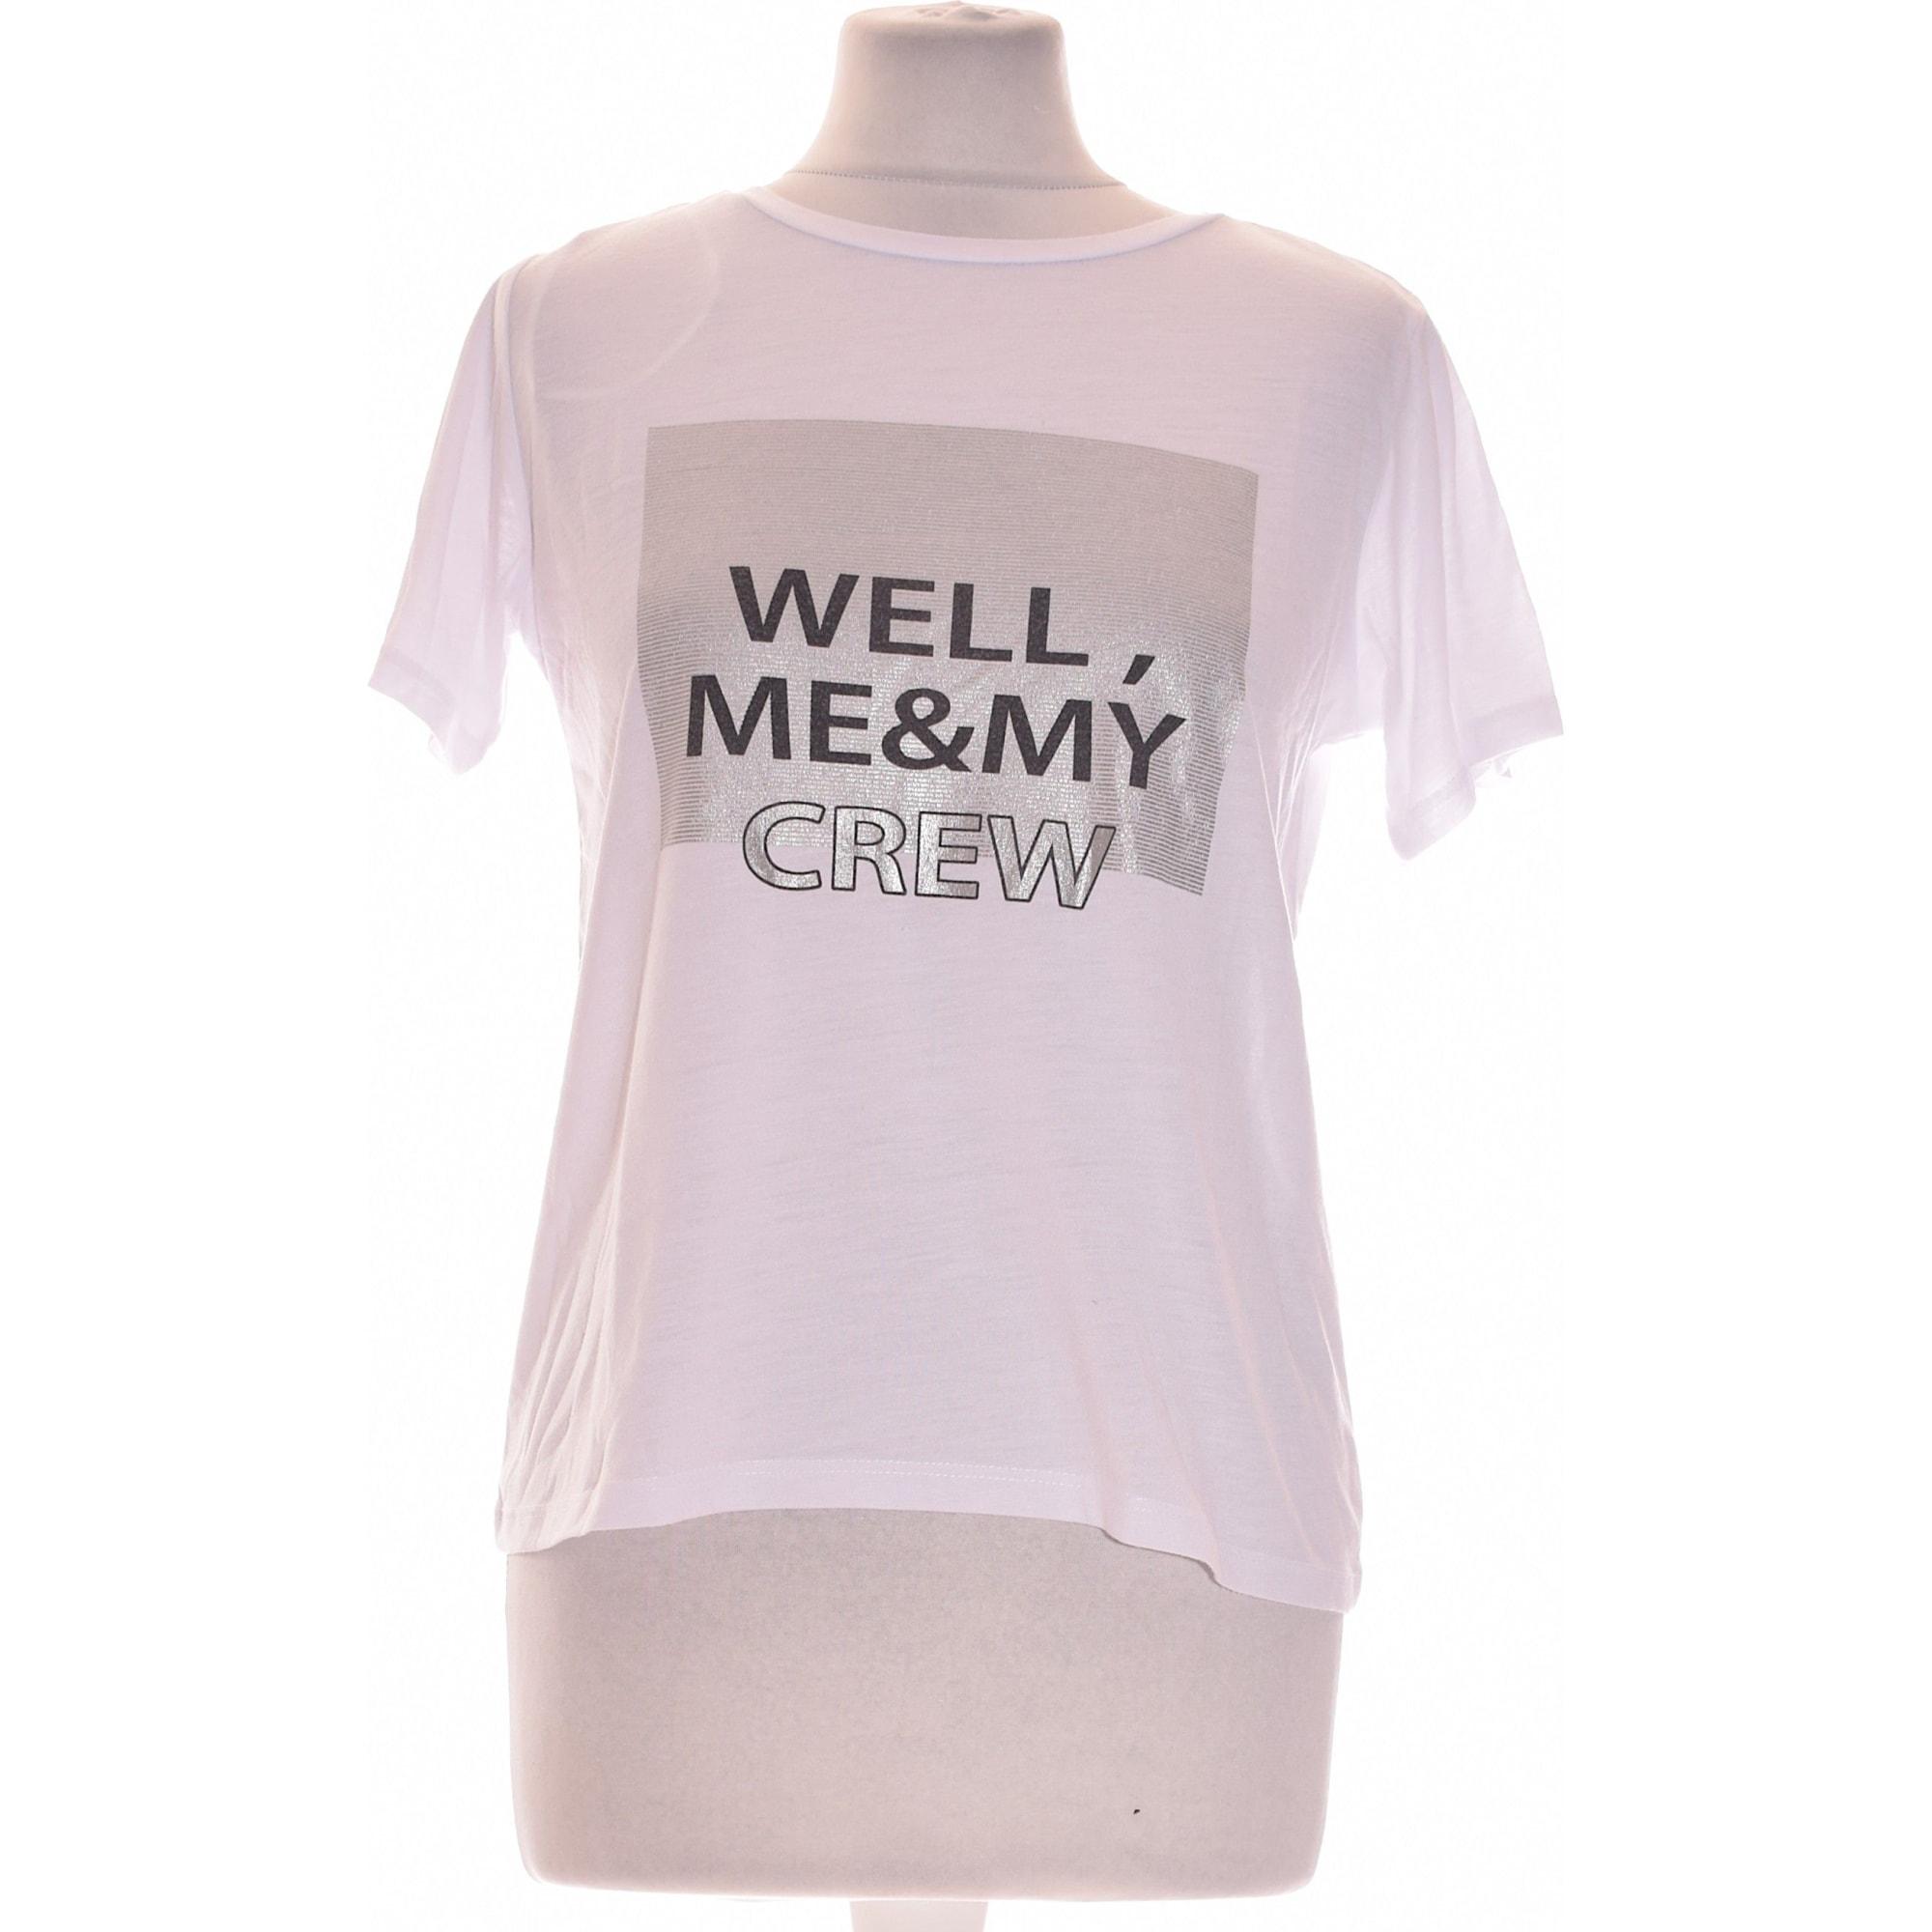 Top, tee-shirt LIBERTO Blanc, blanc cassé, écru